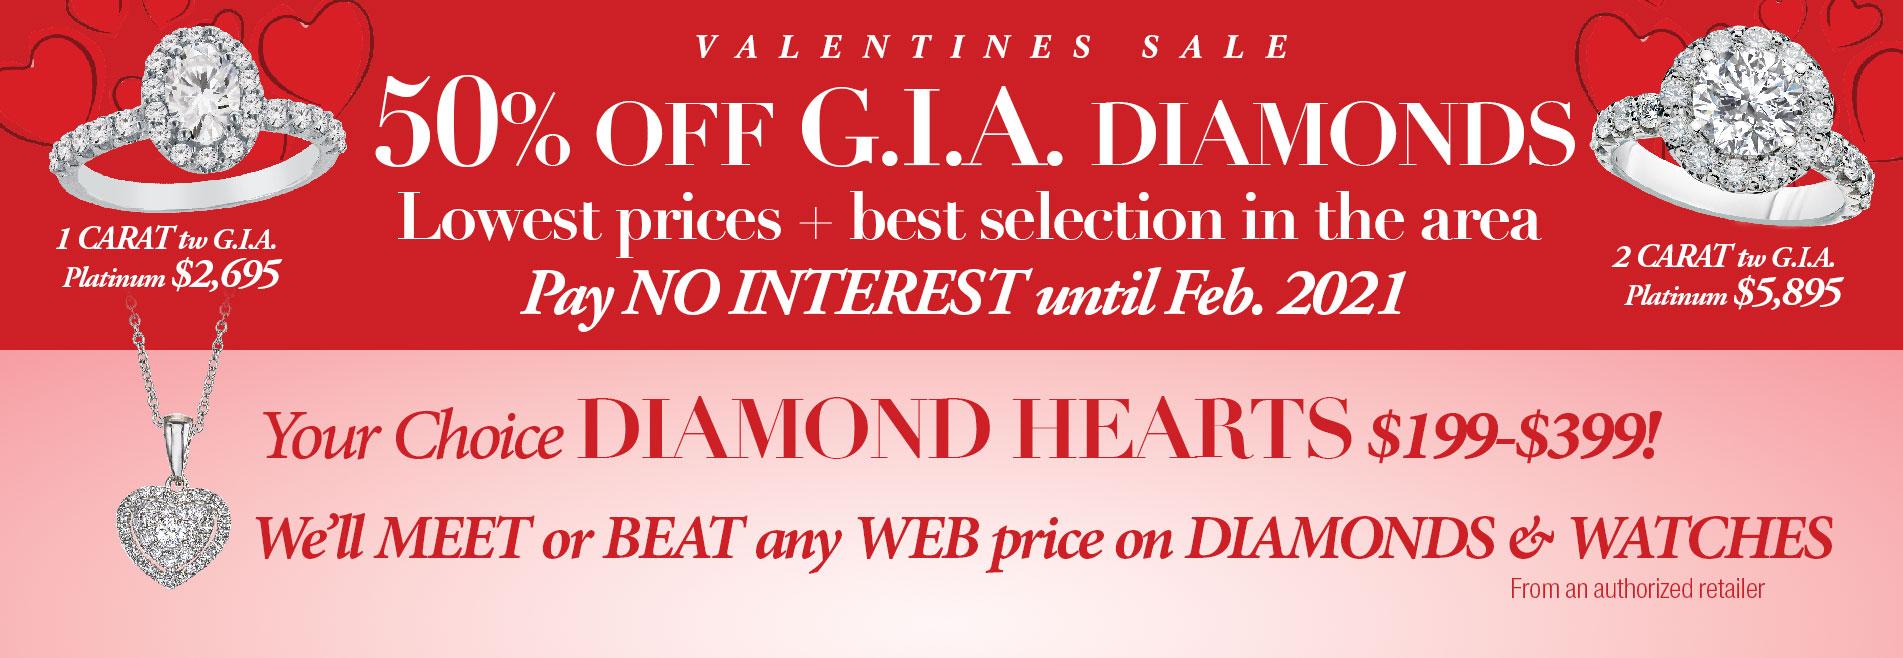 Valentines Day Sale 2020